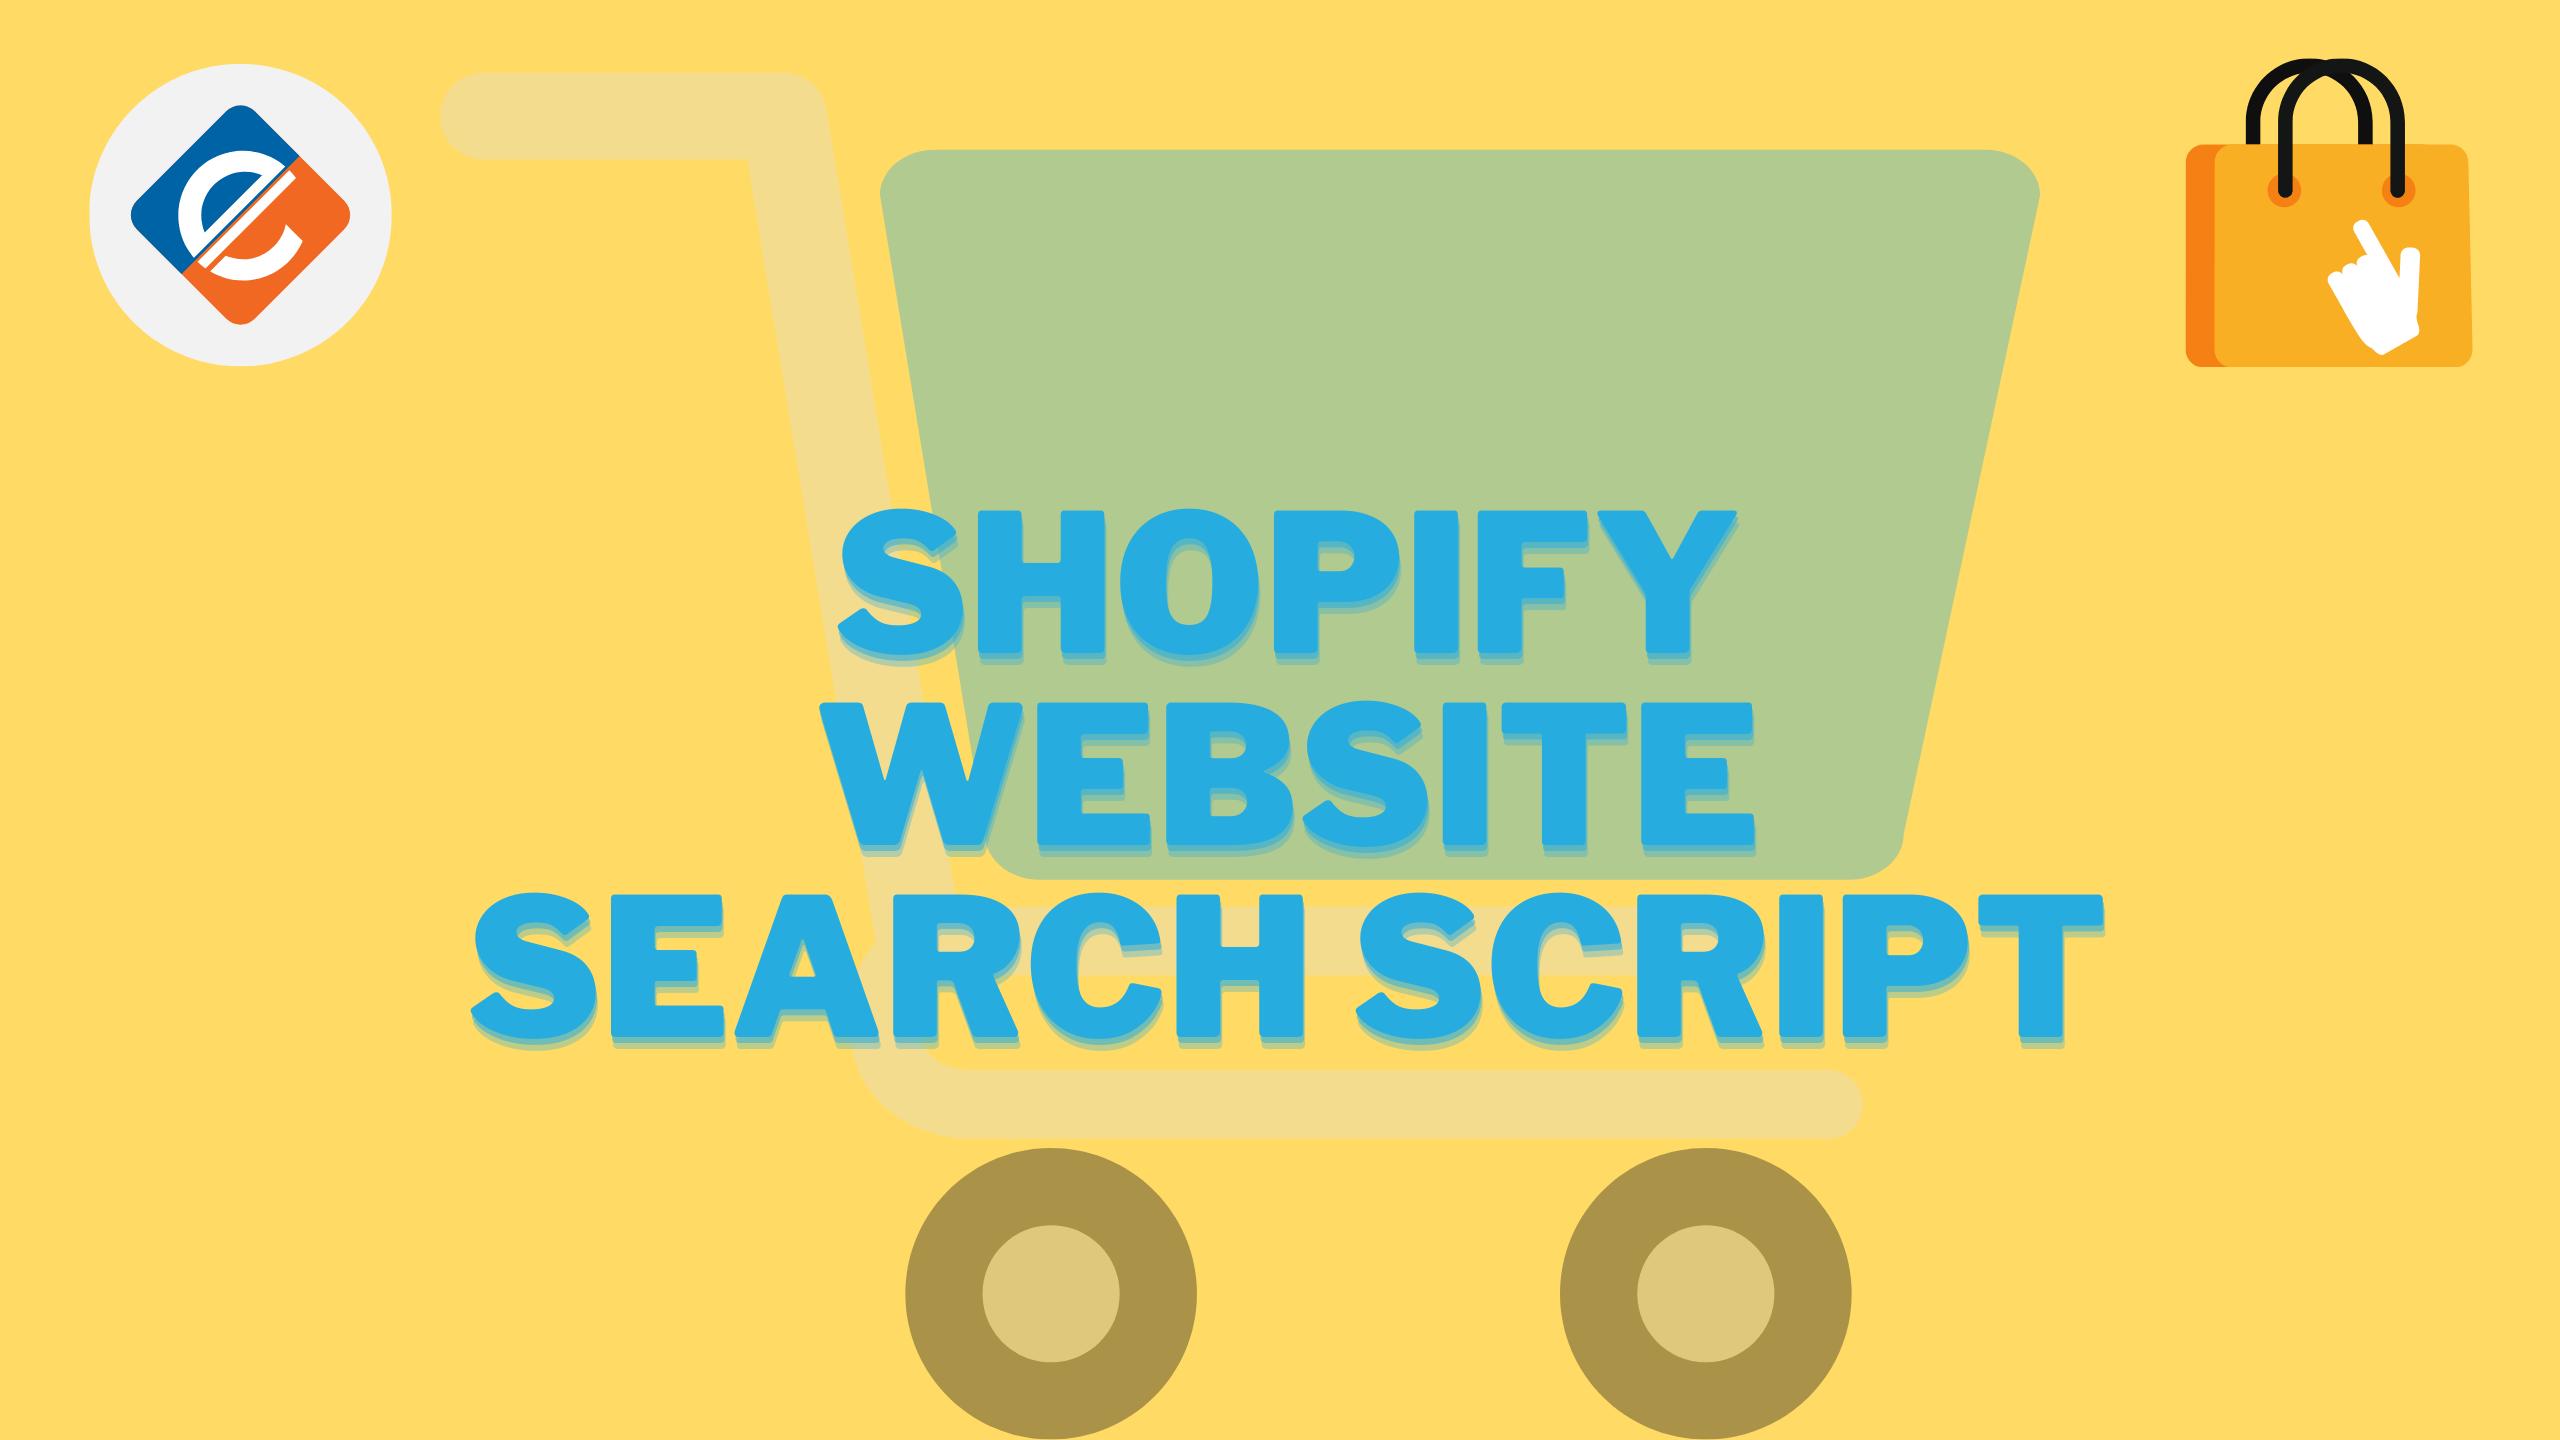 Shopify Website Search Script